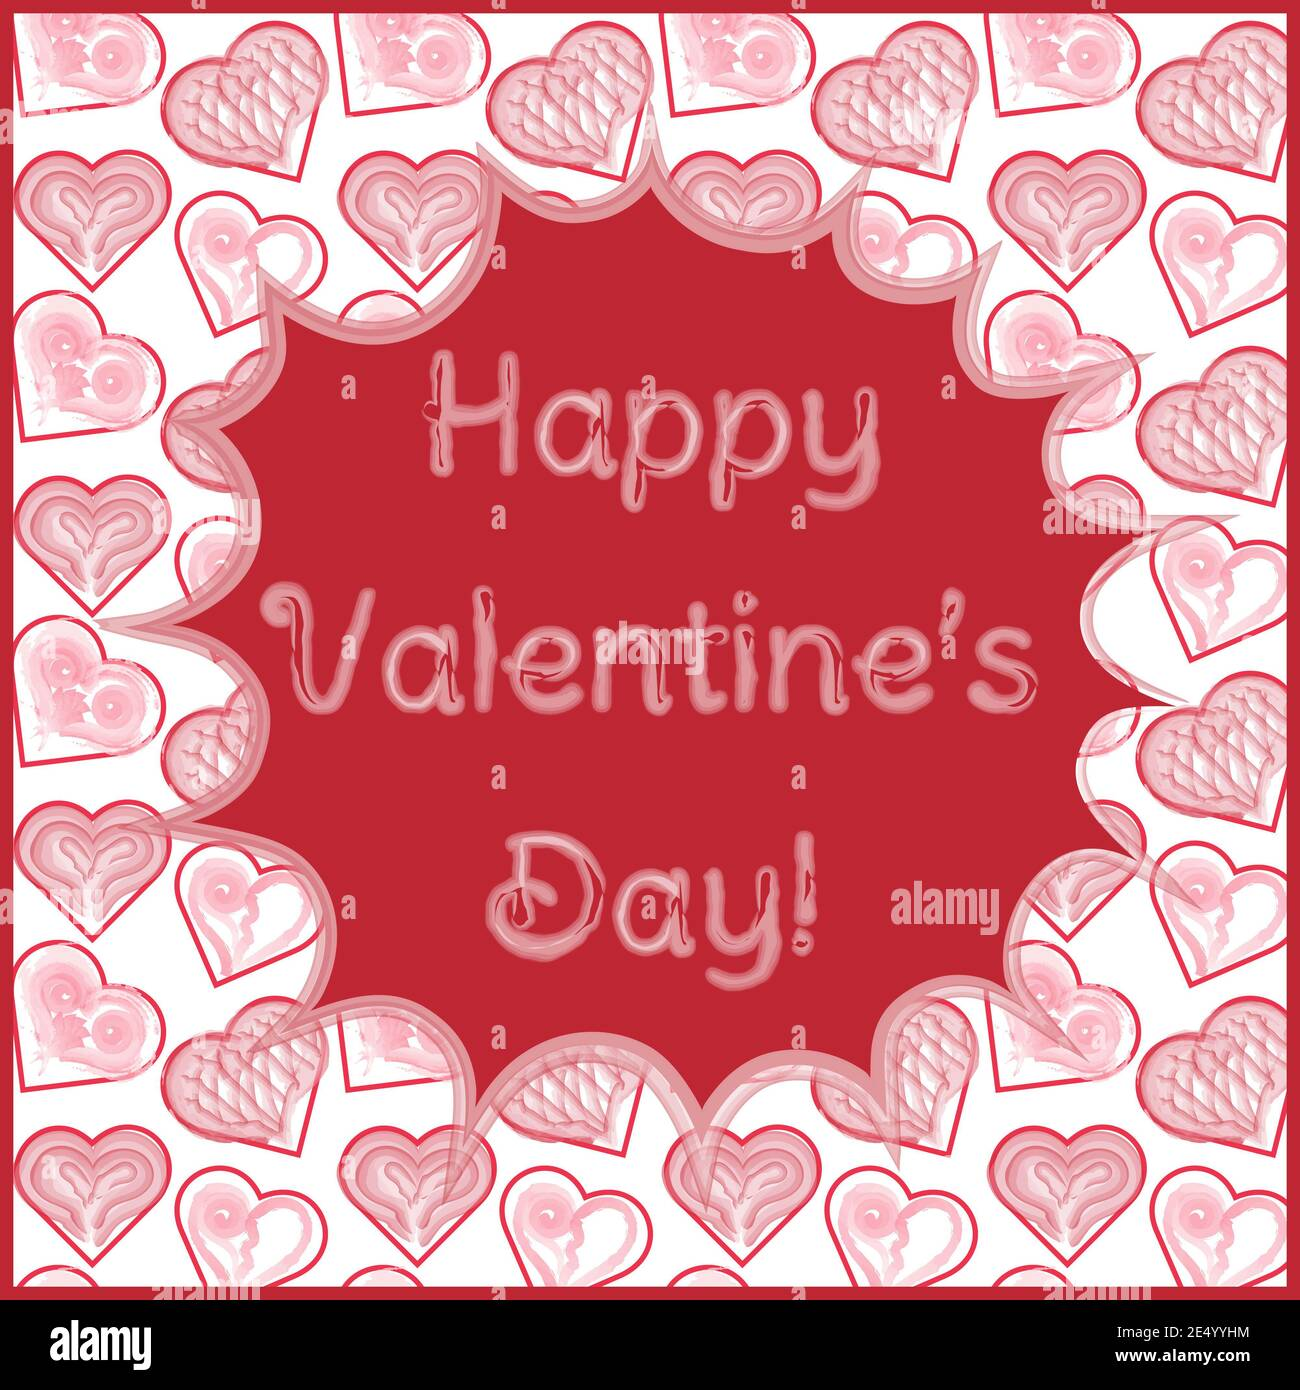 Heart Banner Garland Six Hearts Cherries